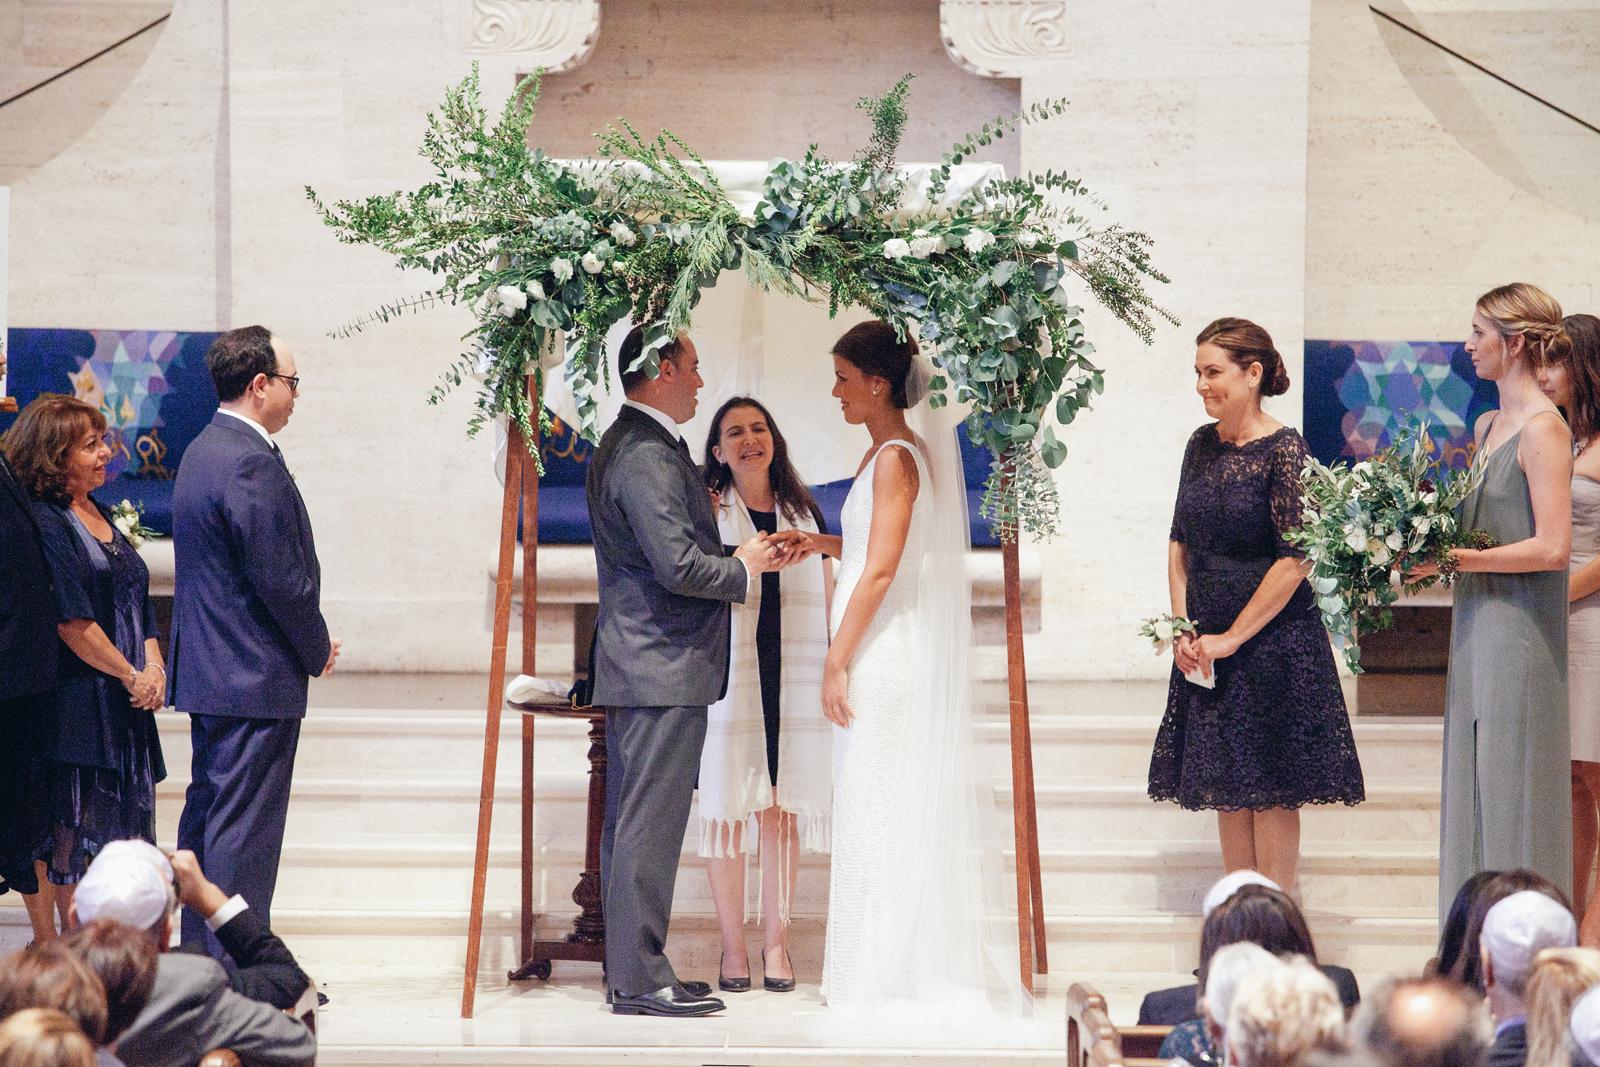 temple_emmanuel_jewish_wedding_san_francisco_ca_sarah_andrew_ebony_siovhan_bokeh_photography_52.jpg